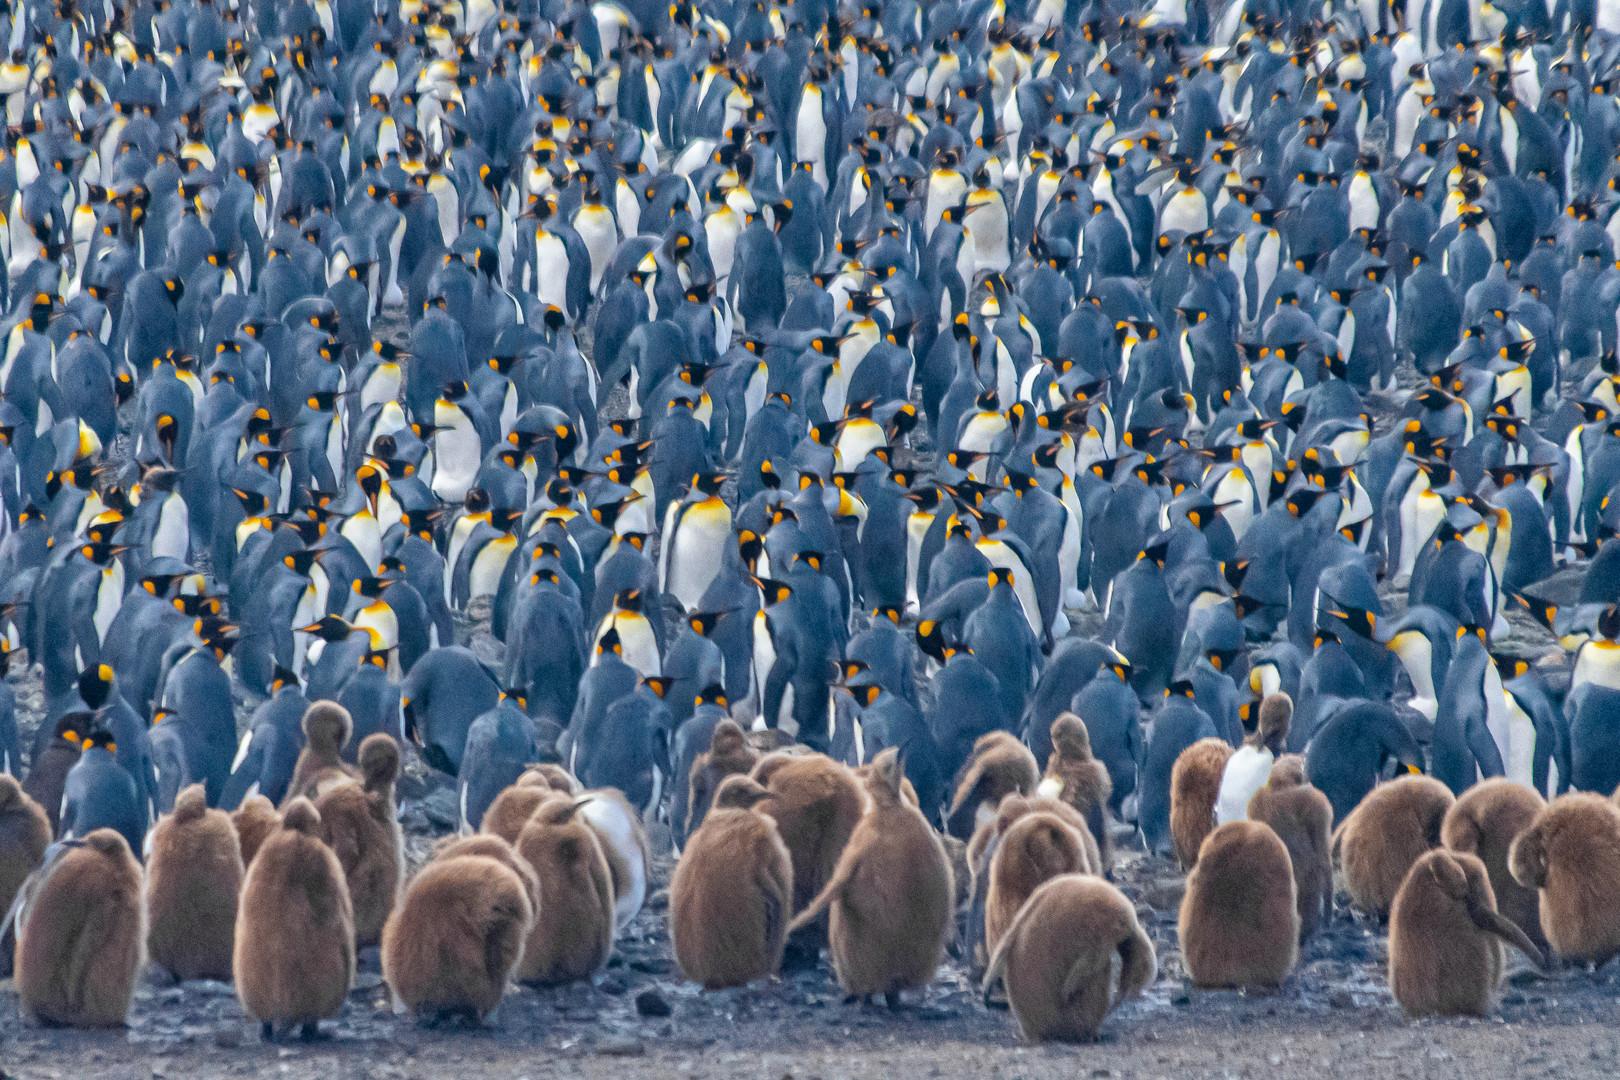 Crowd of king penguins, South Georgia  | Laura Jourdan Photography